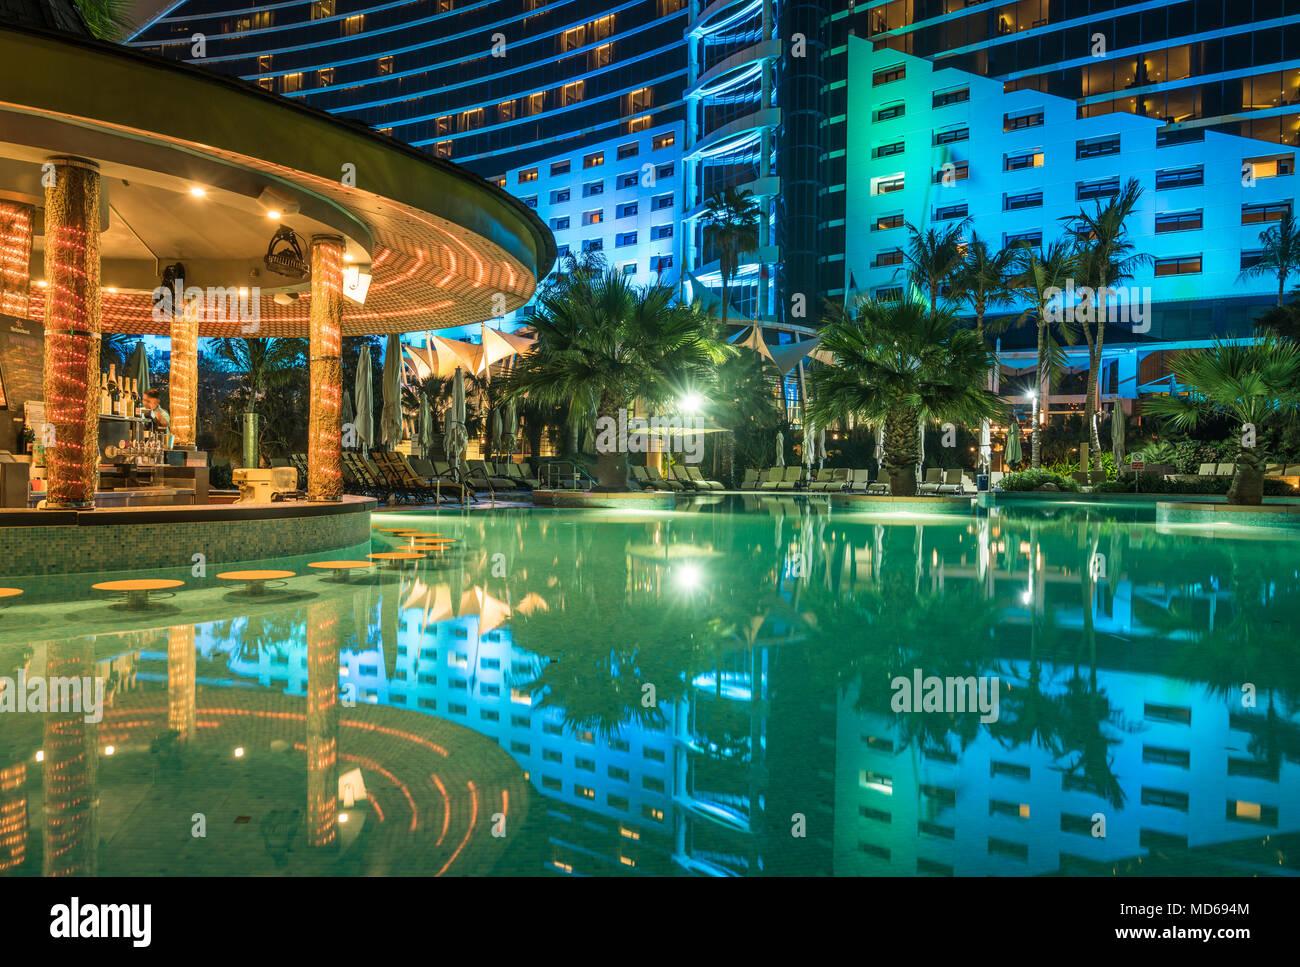 Swimming pool bar stock photos swimming pool bar stock - Jumeirah beach hotel swimming pool ...